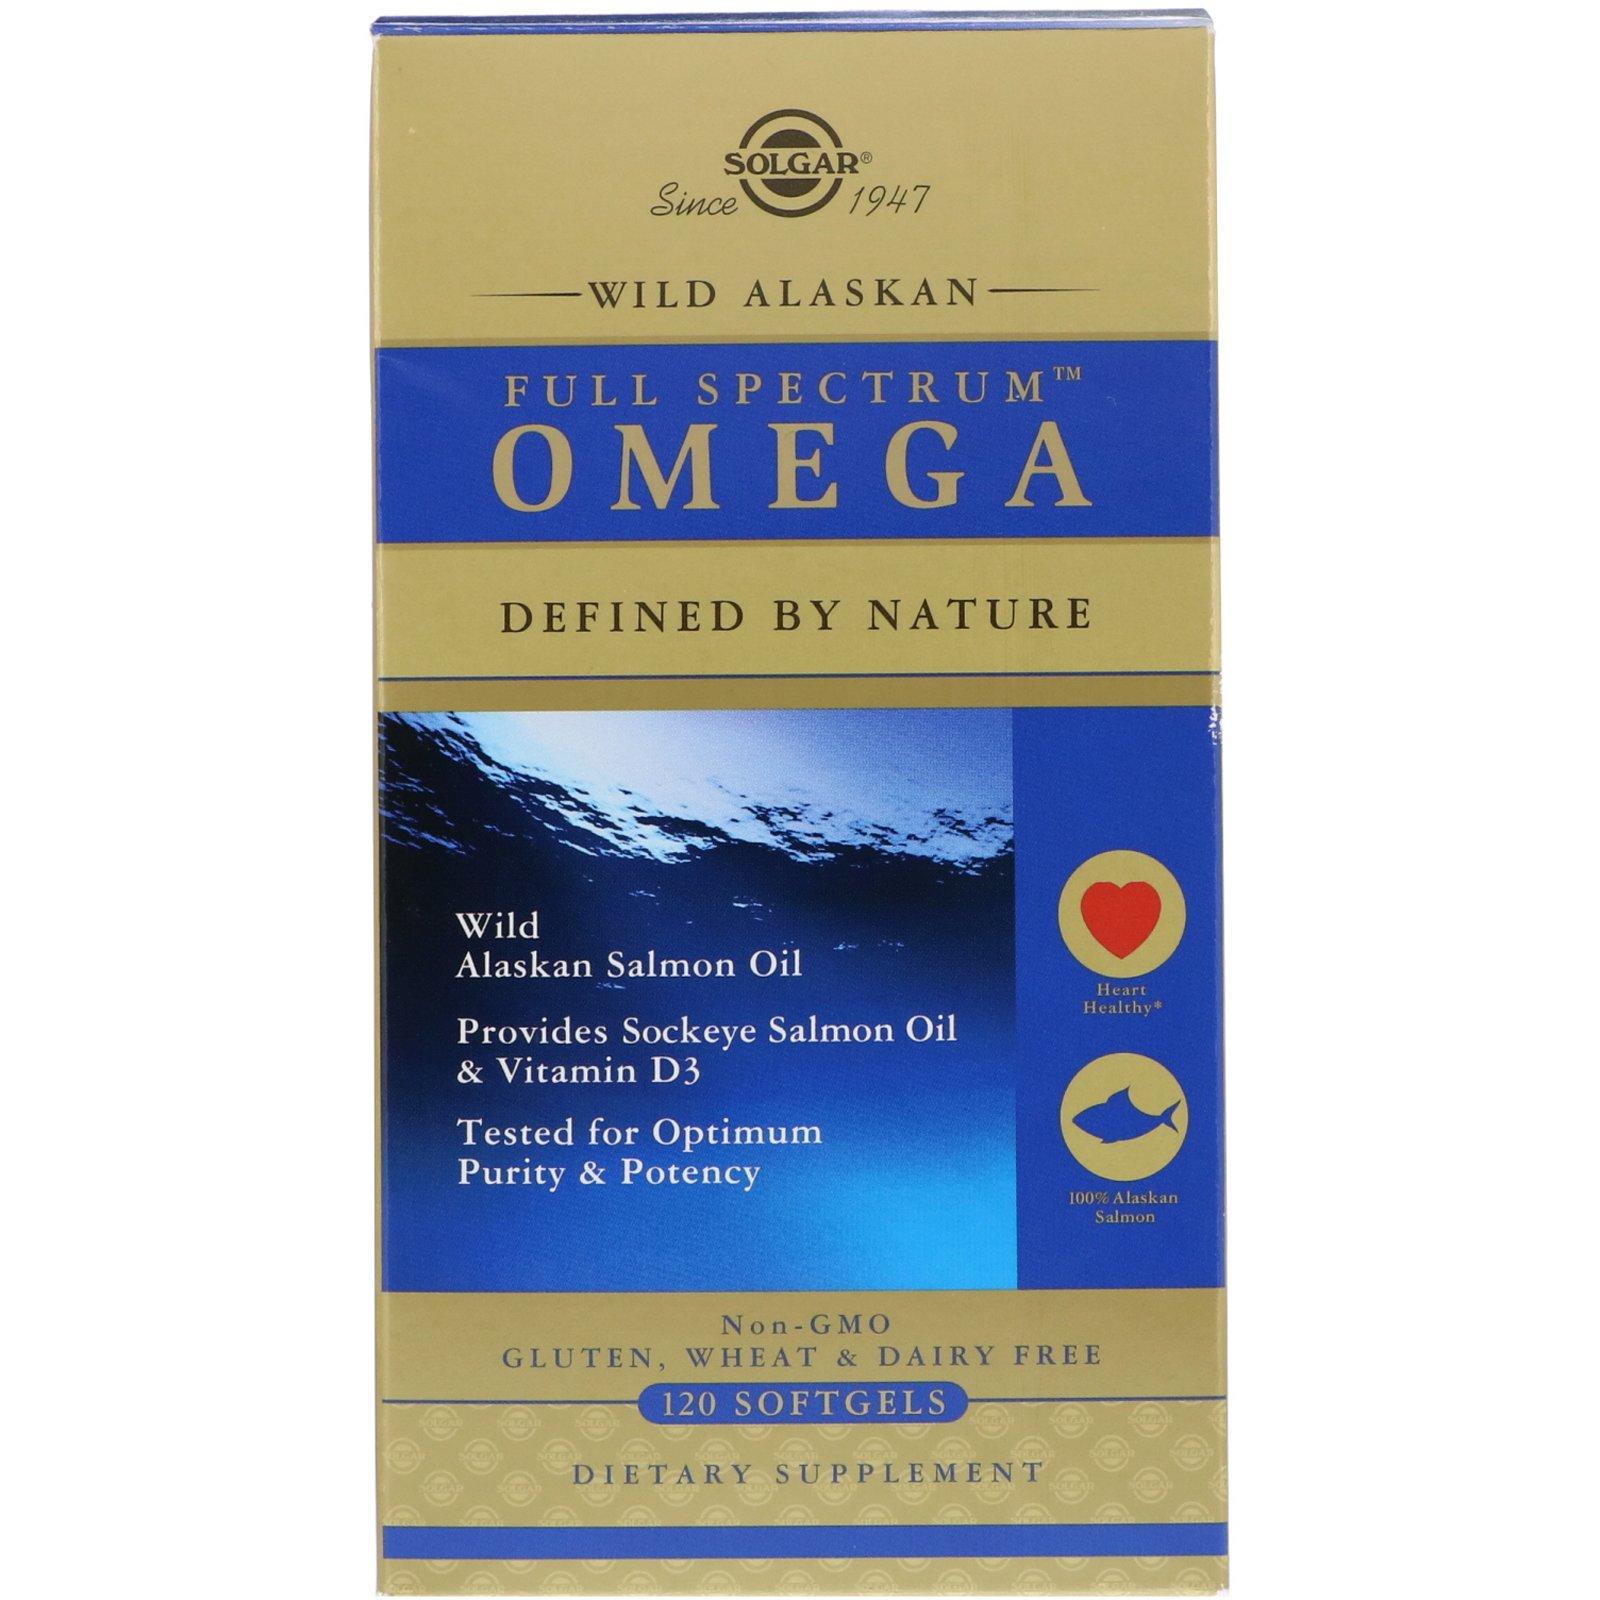 Solgar Wild Alaskan Full Spectrum Omega Συμπλήρωμα Διατροφής, Παρέχει Αντιφλεγμονώδη Δράση 120s.gels